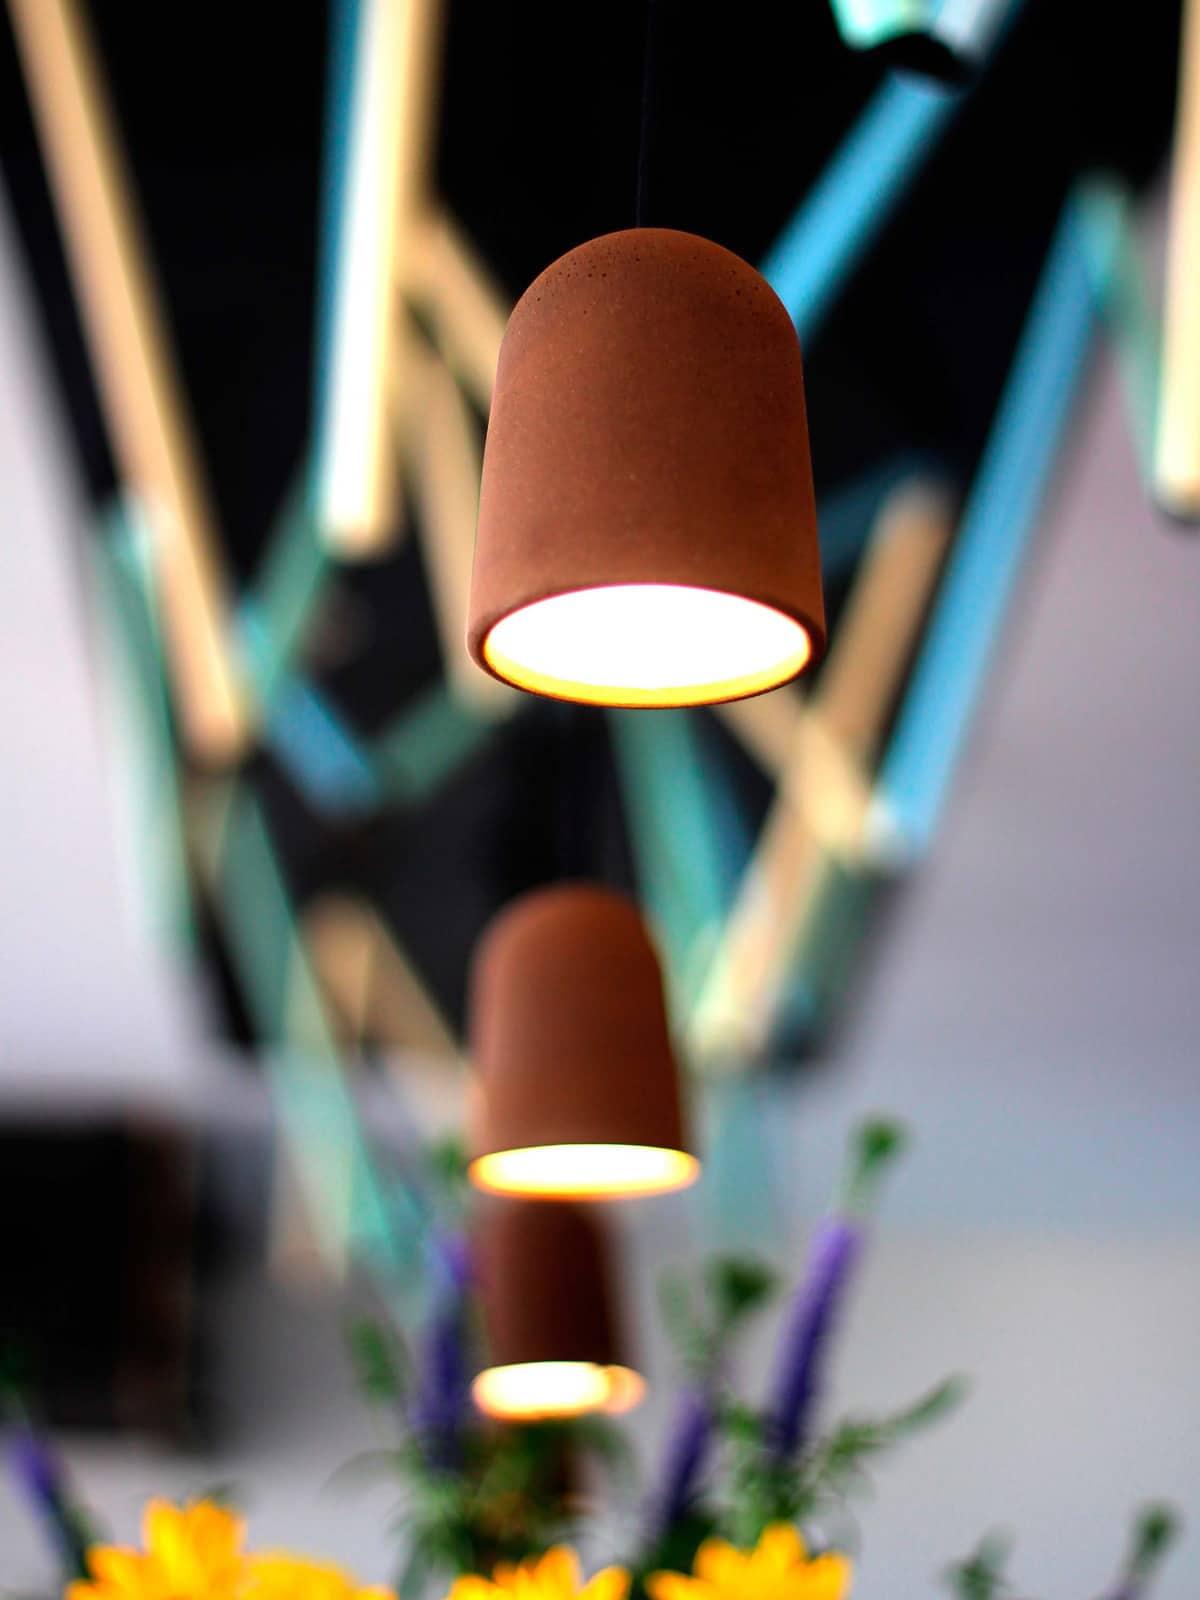 DesignOrt Blog: Jahresrückblick 2018 Koji S decafe